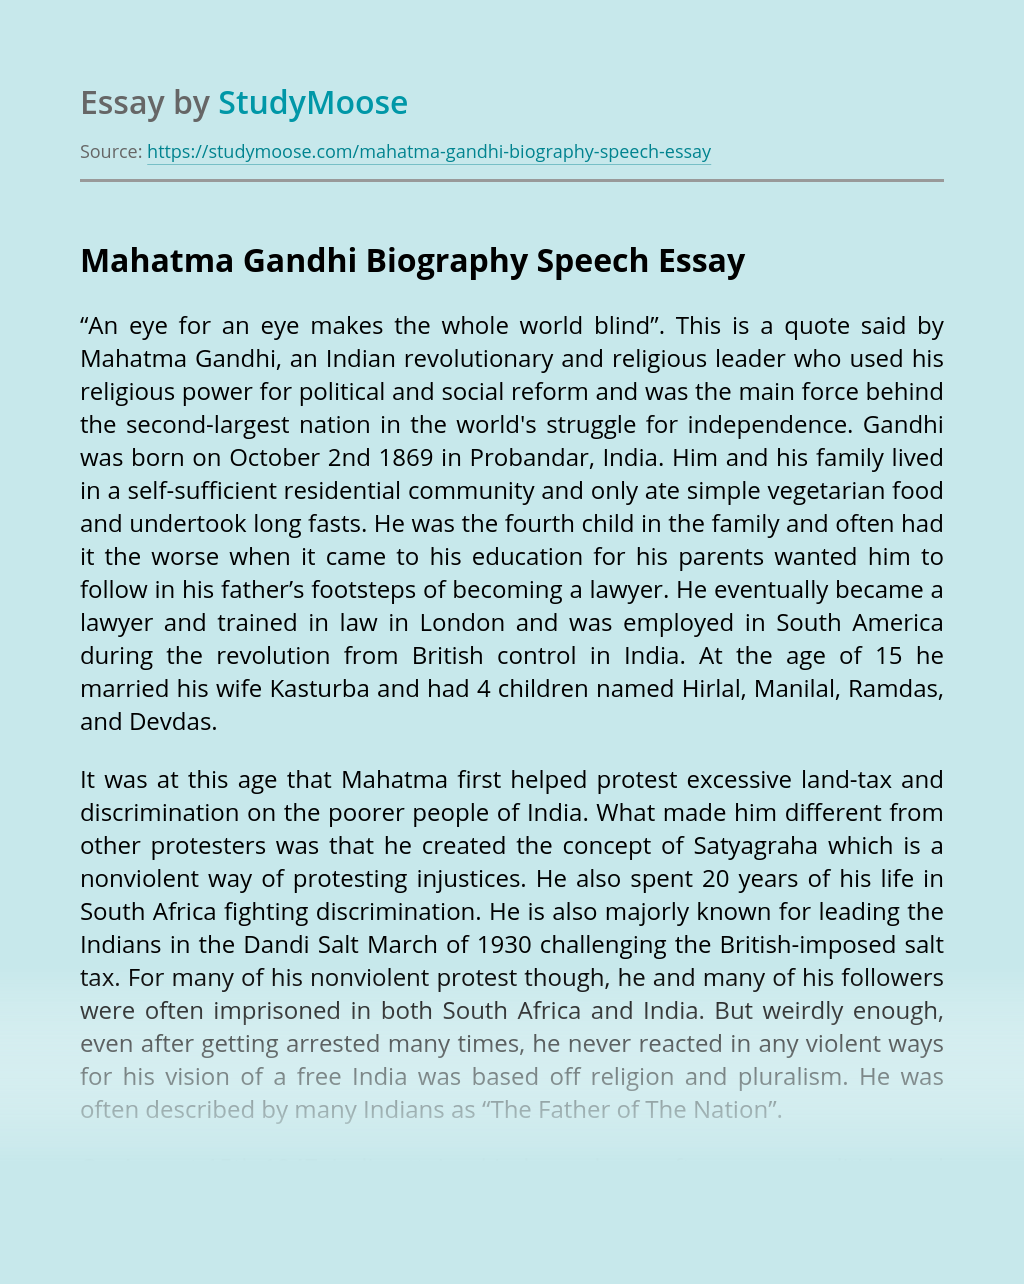 Mahatma Gandhi Biography Speech